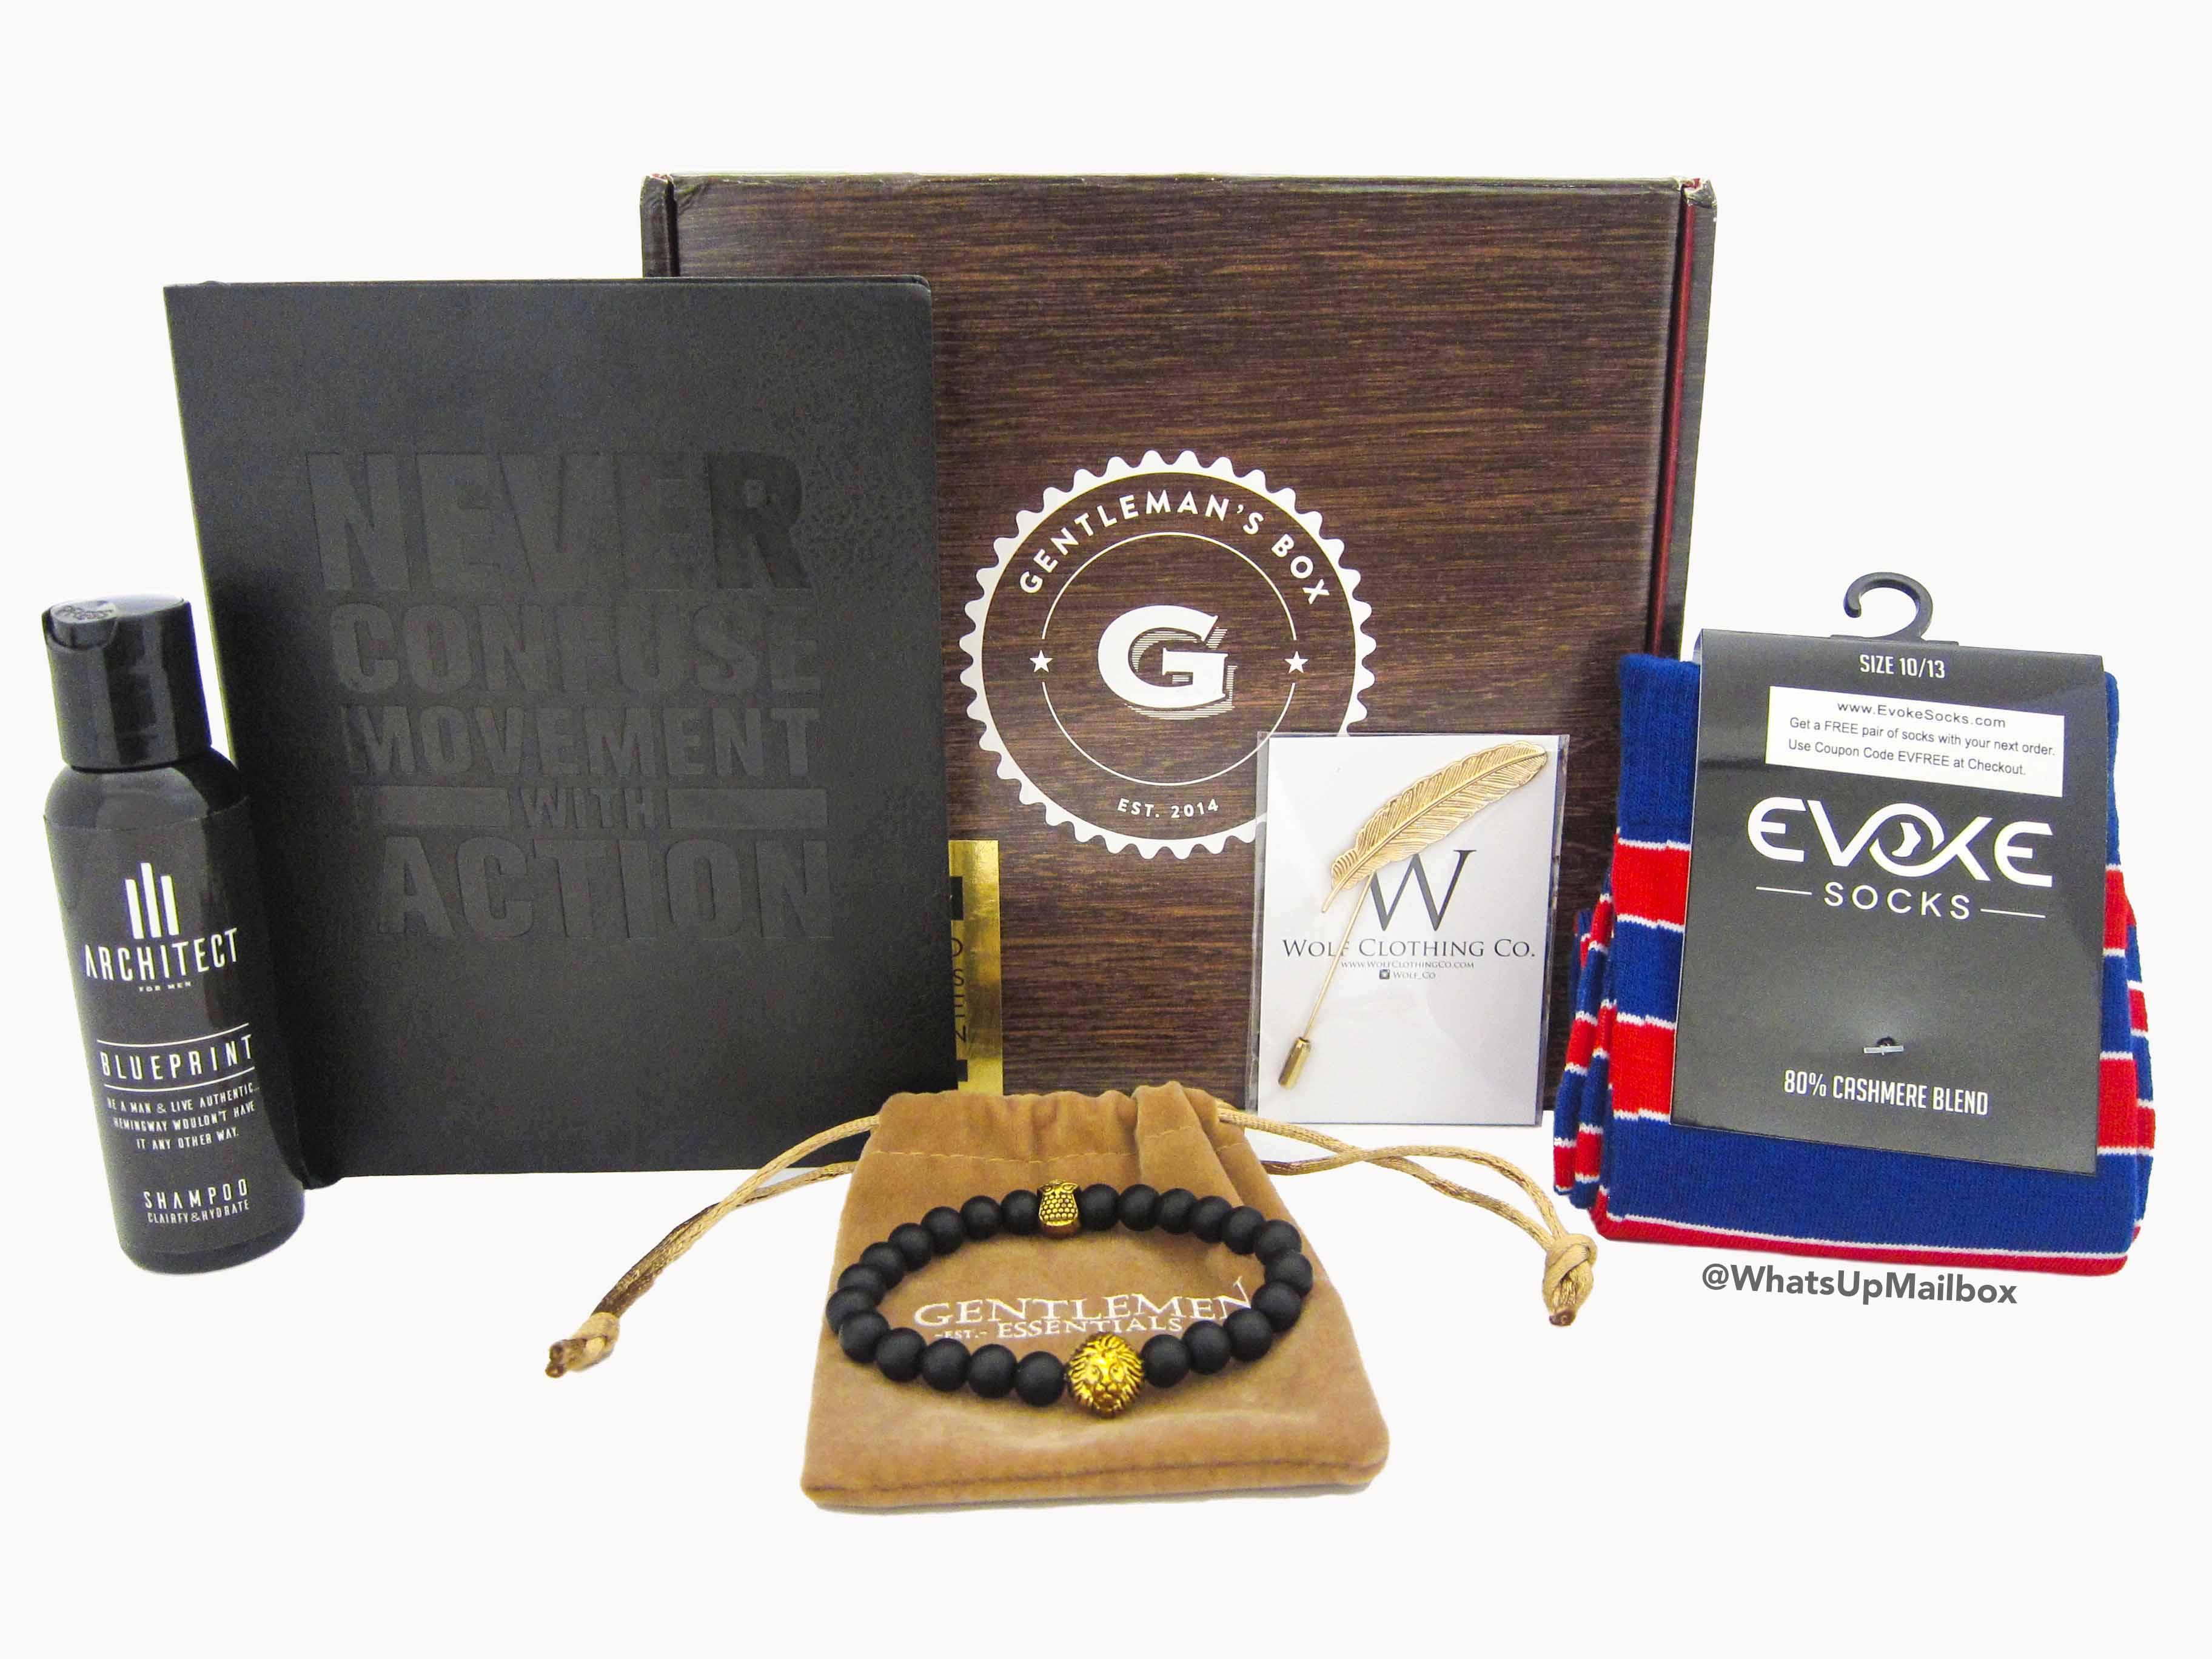 Gentleman's Box September 2016 Items